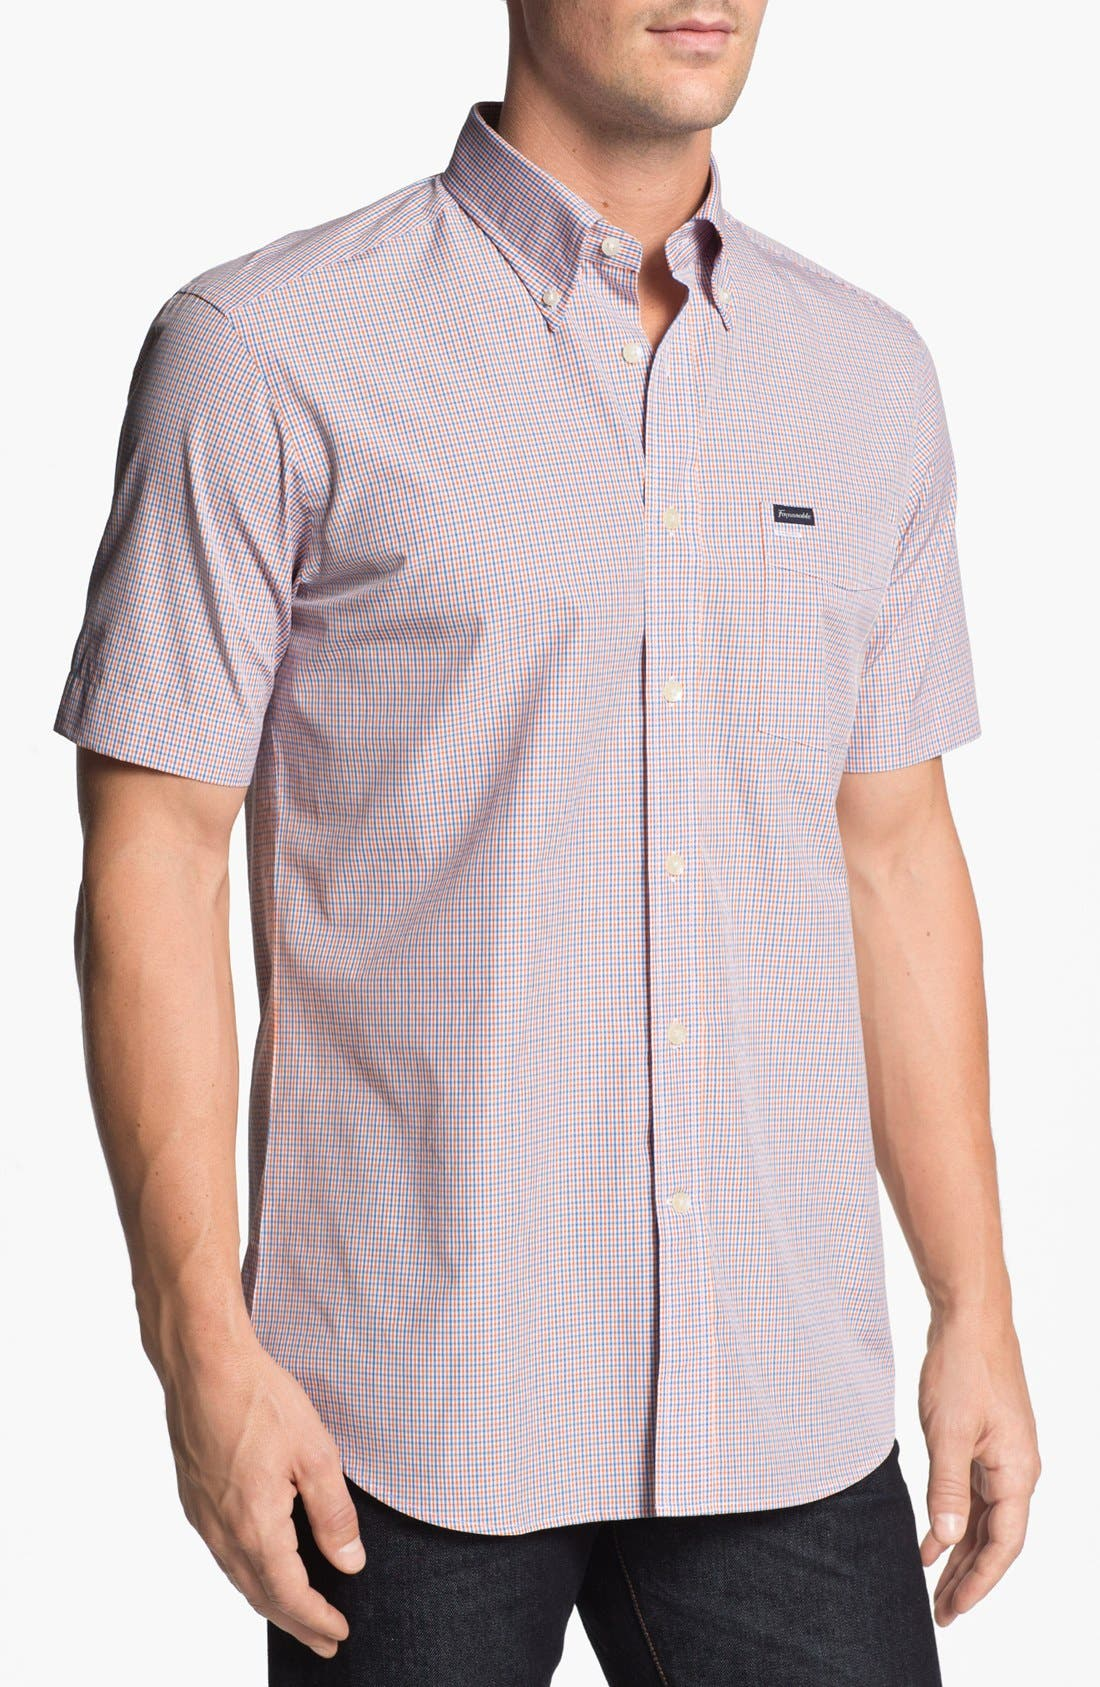 Main Image - Façonnable Club Fit Short Sleeve Sport Shirt